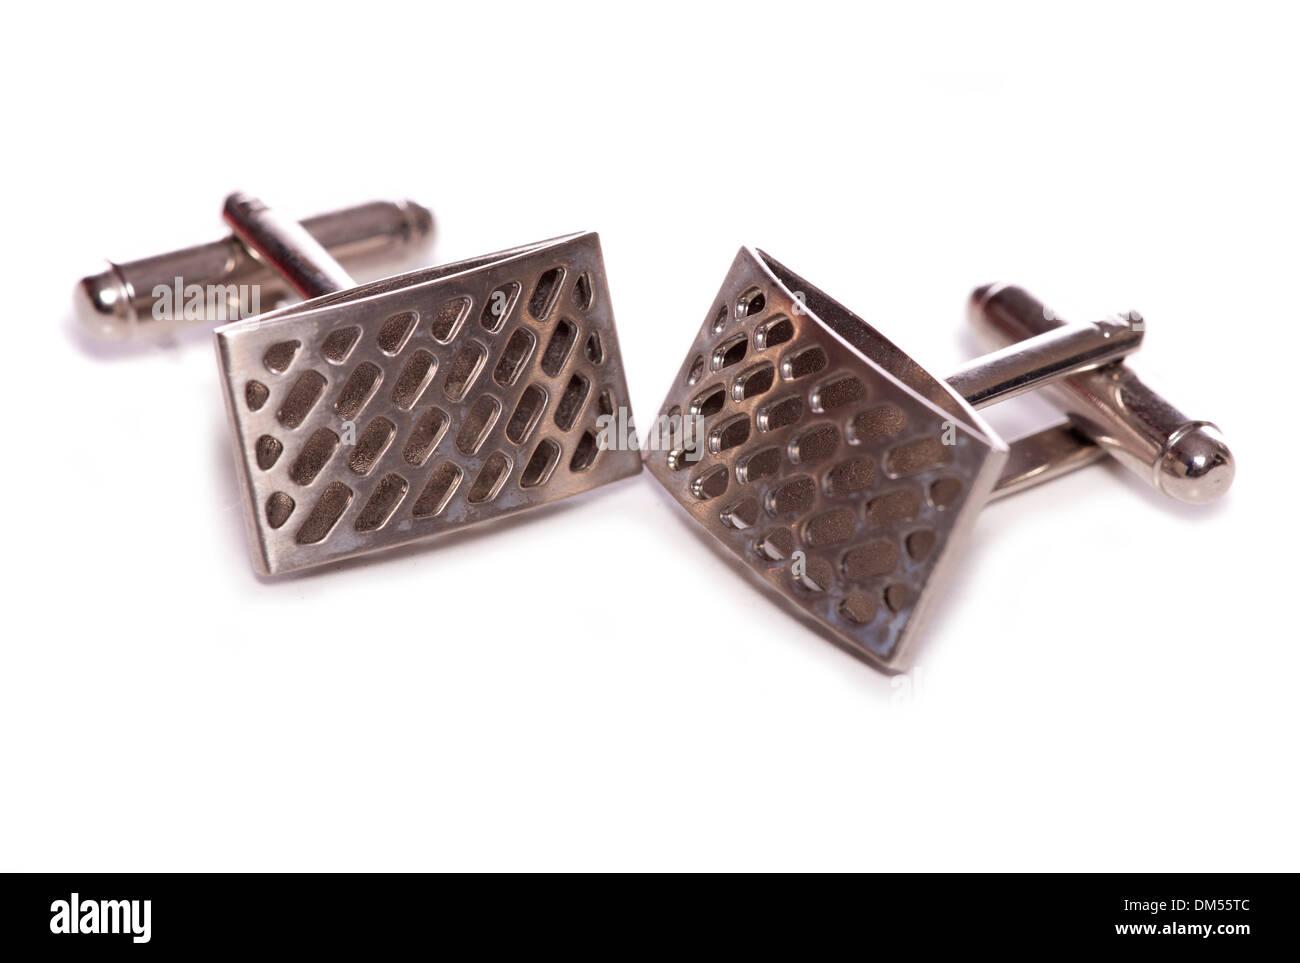 silver cuff links studio cutout - Stock Image